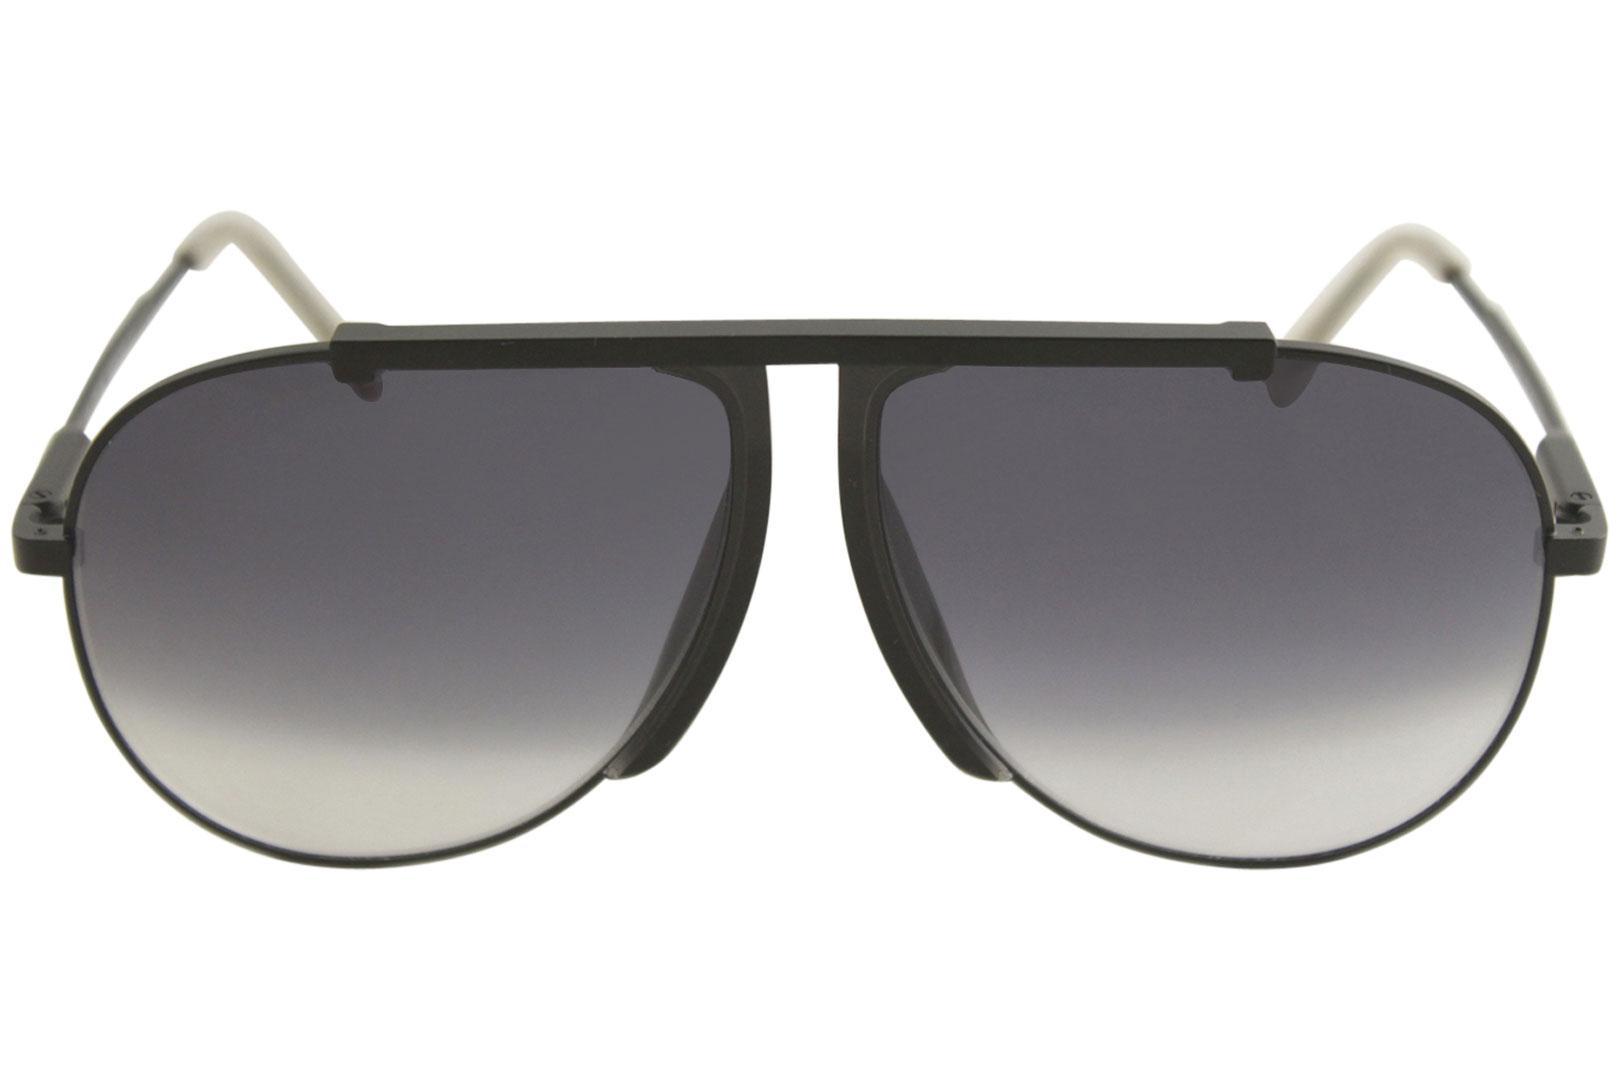 bf57e7f9ed6 Celine Women s CL40026I CL 40026 I Fashion Pilot Sunglasses by Celine. 12345